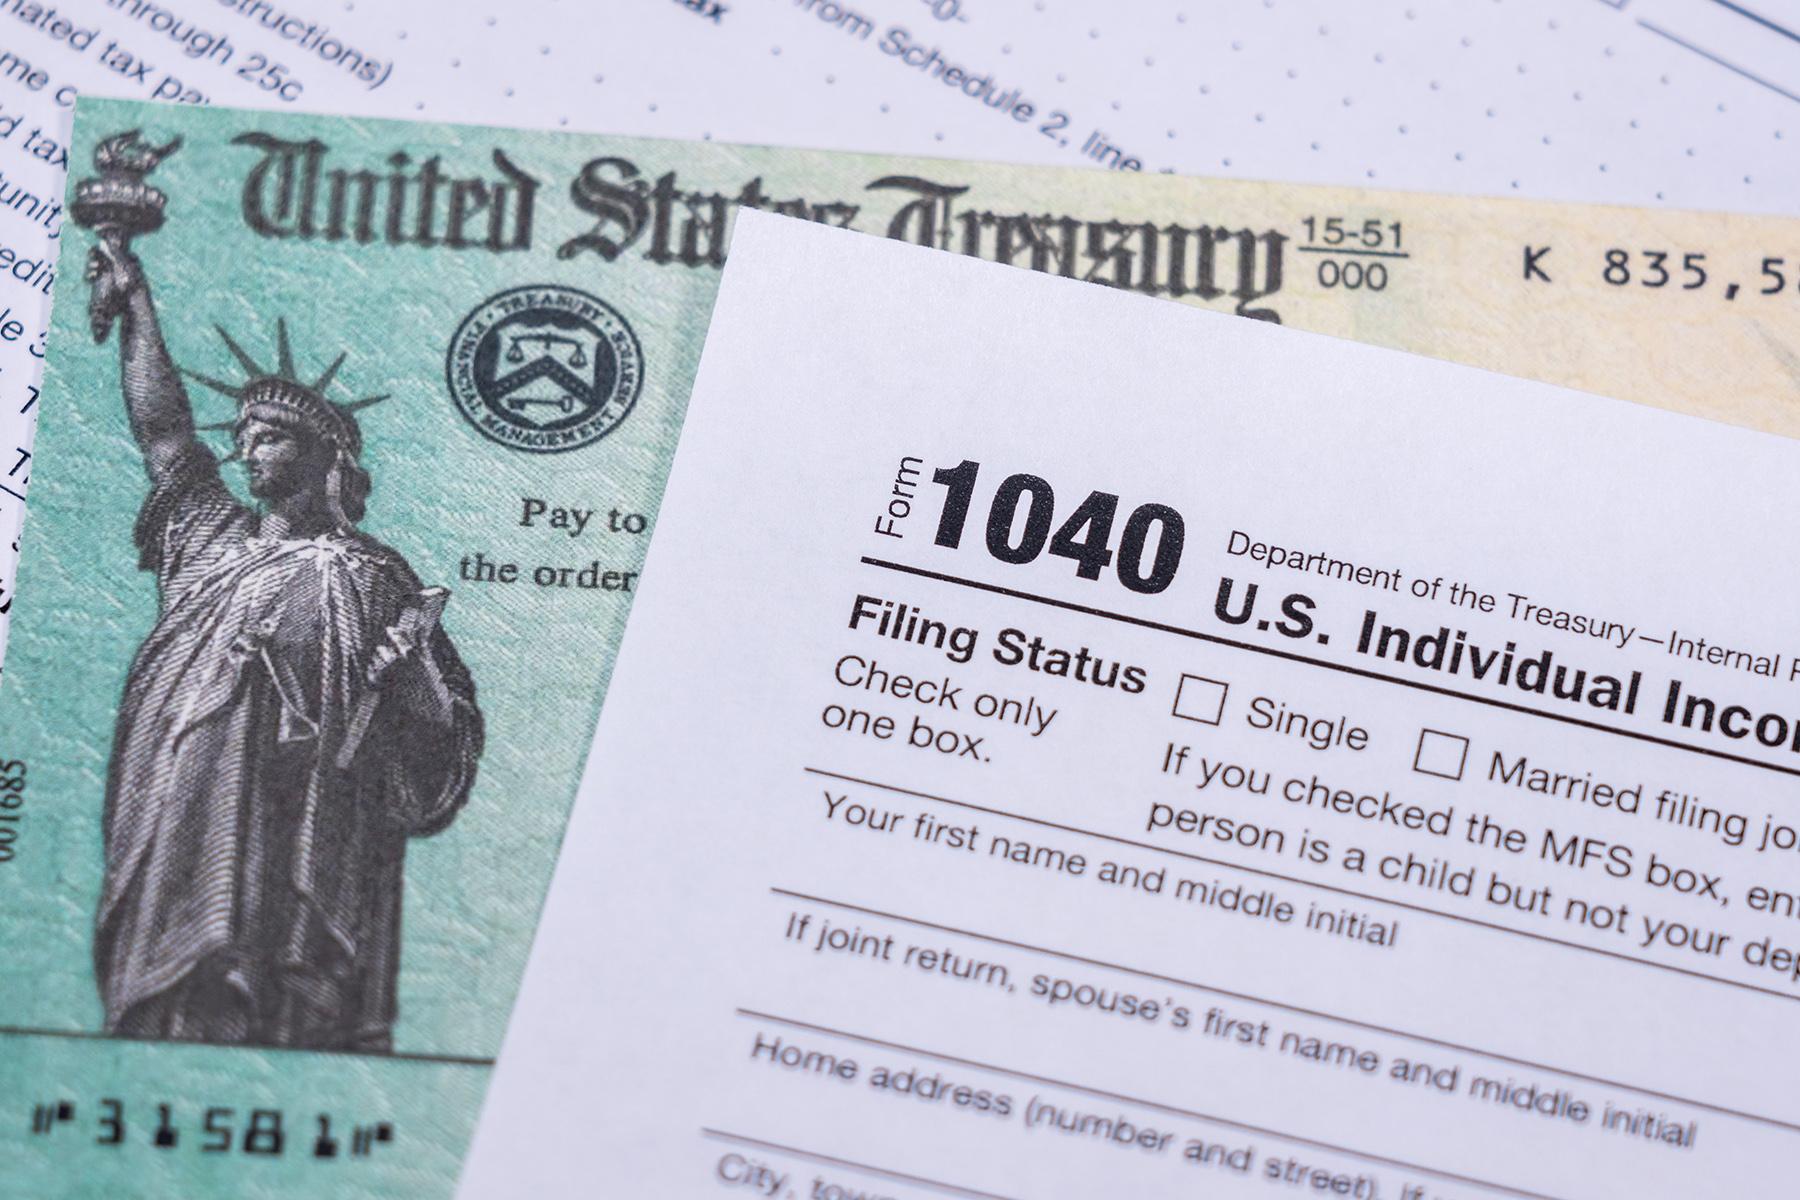 US Form 1040